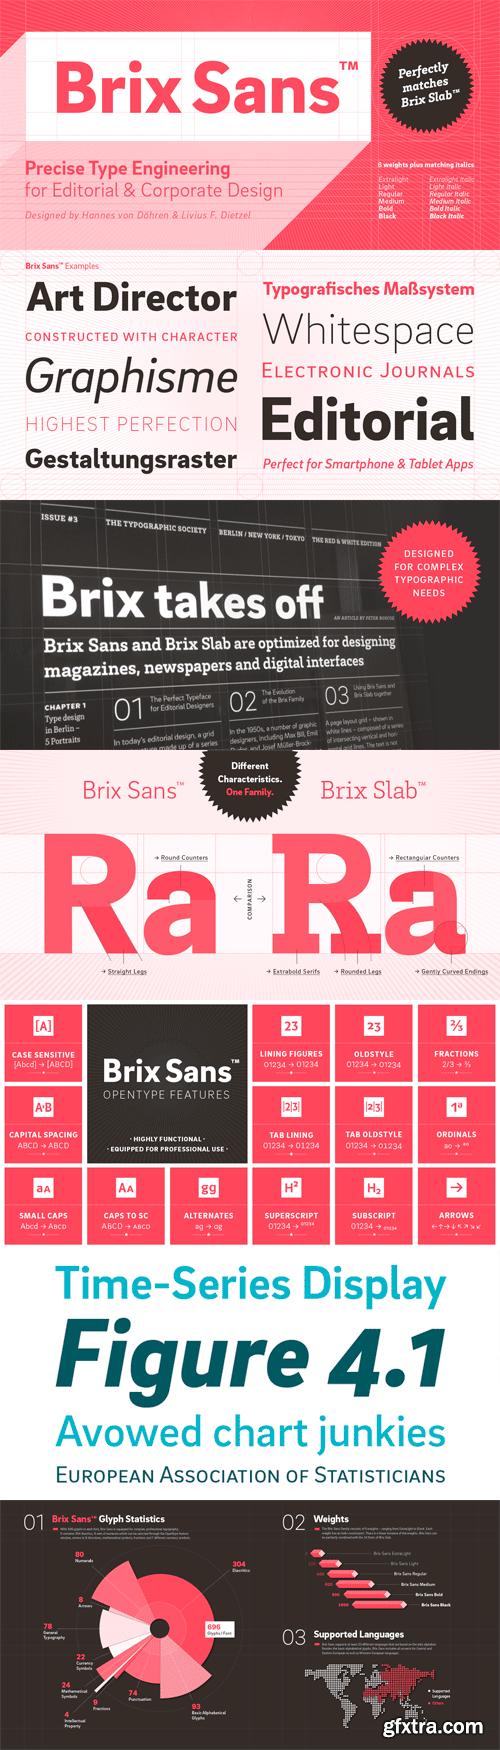 Brix Sans Font Family - 12 Fonts for $249